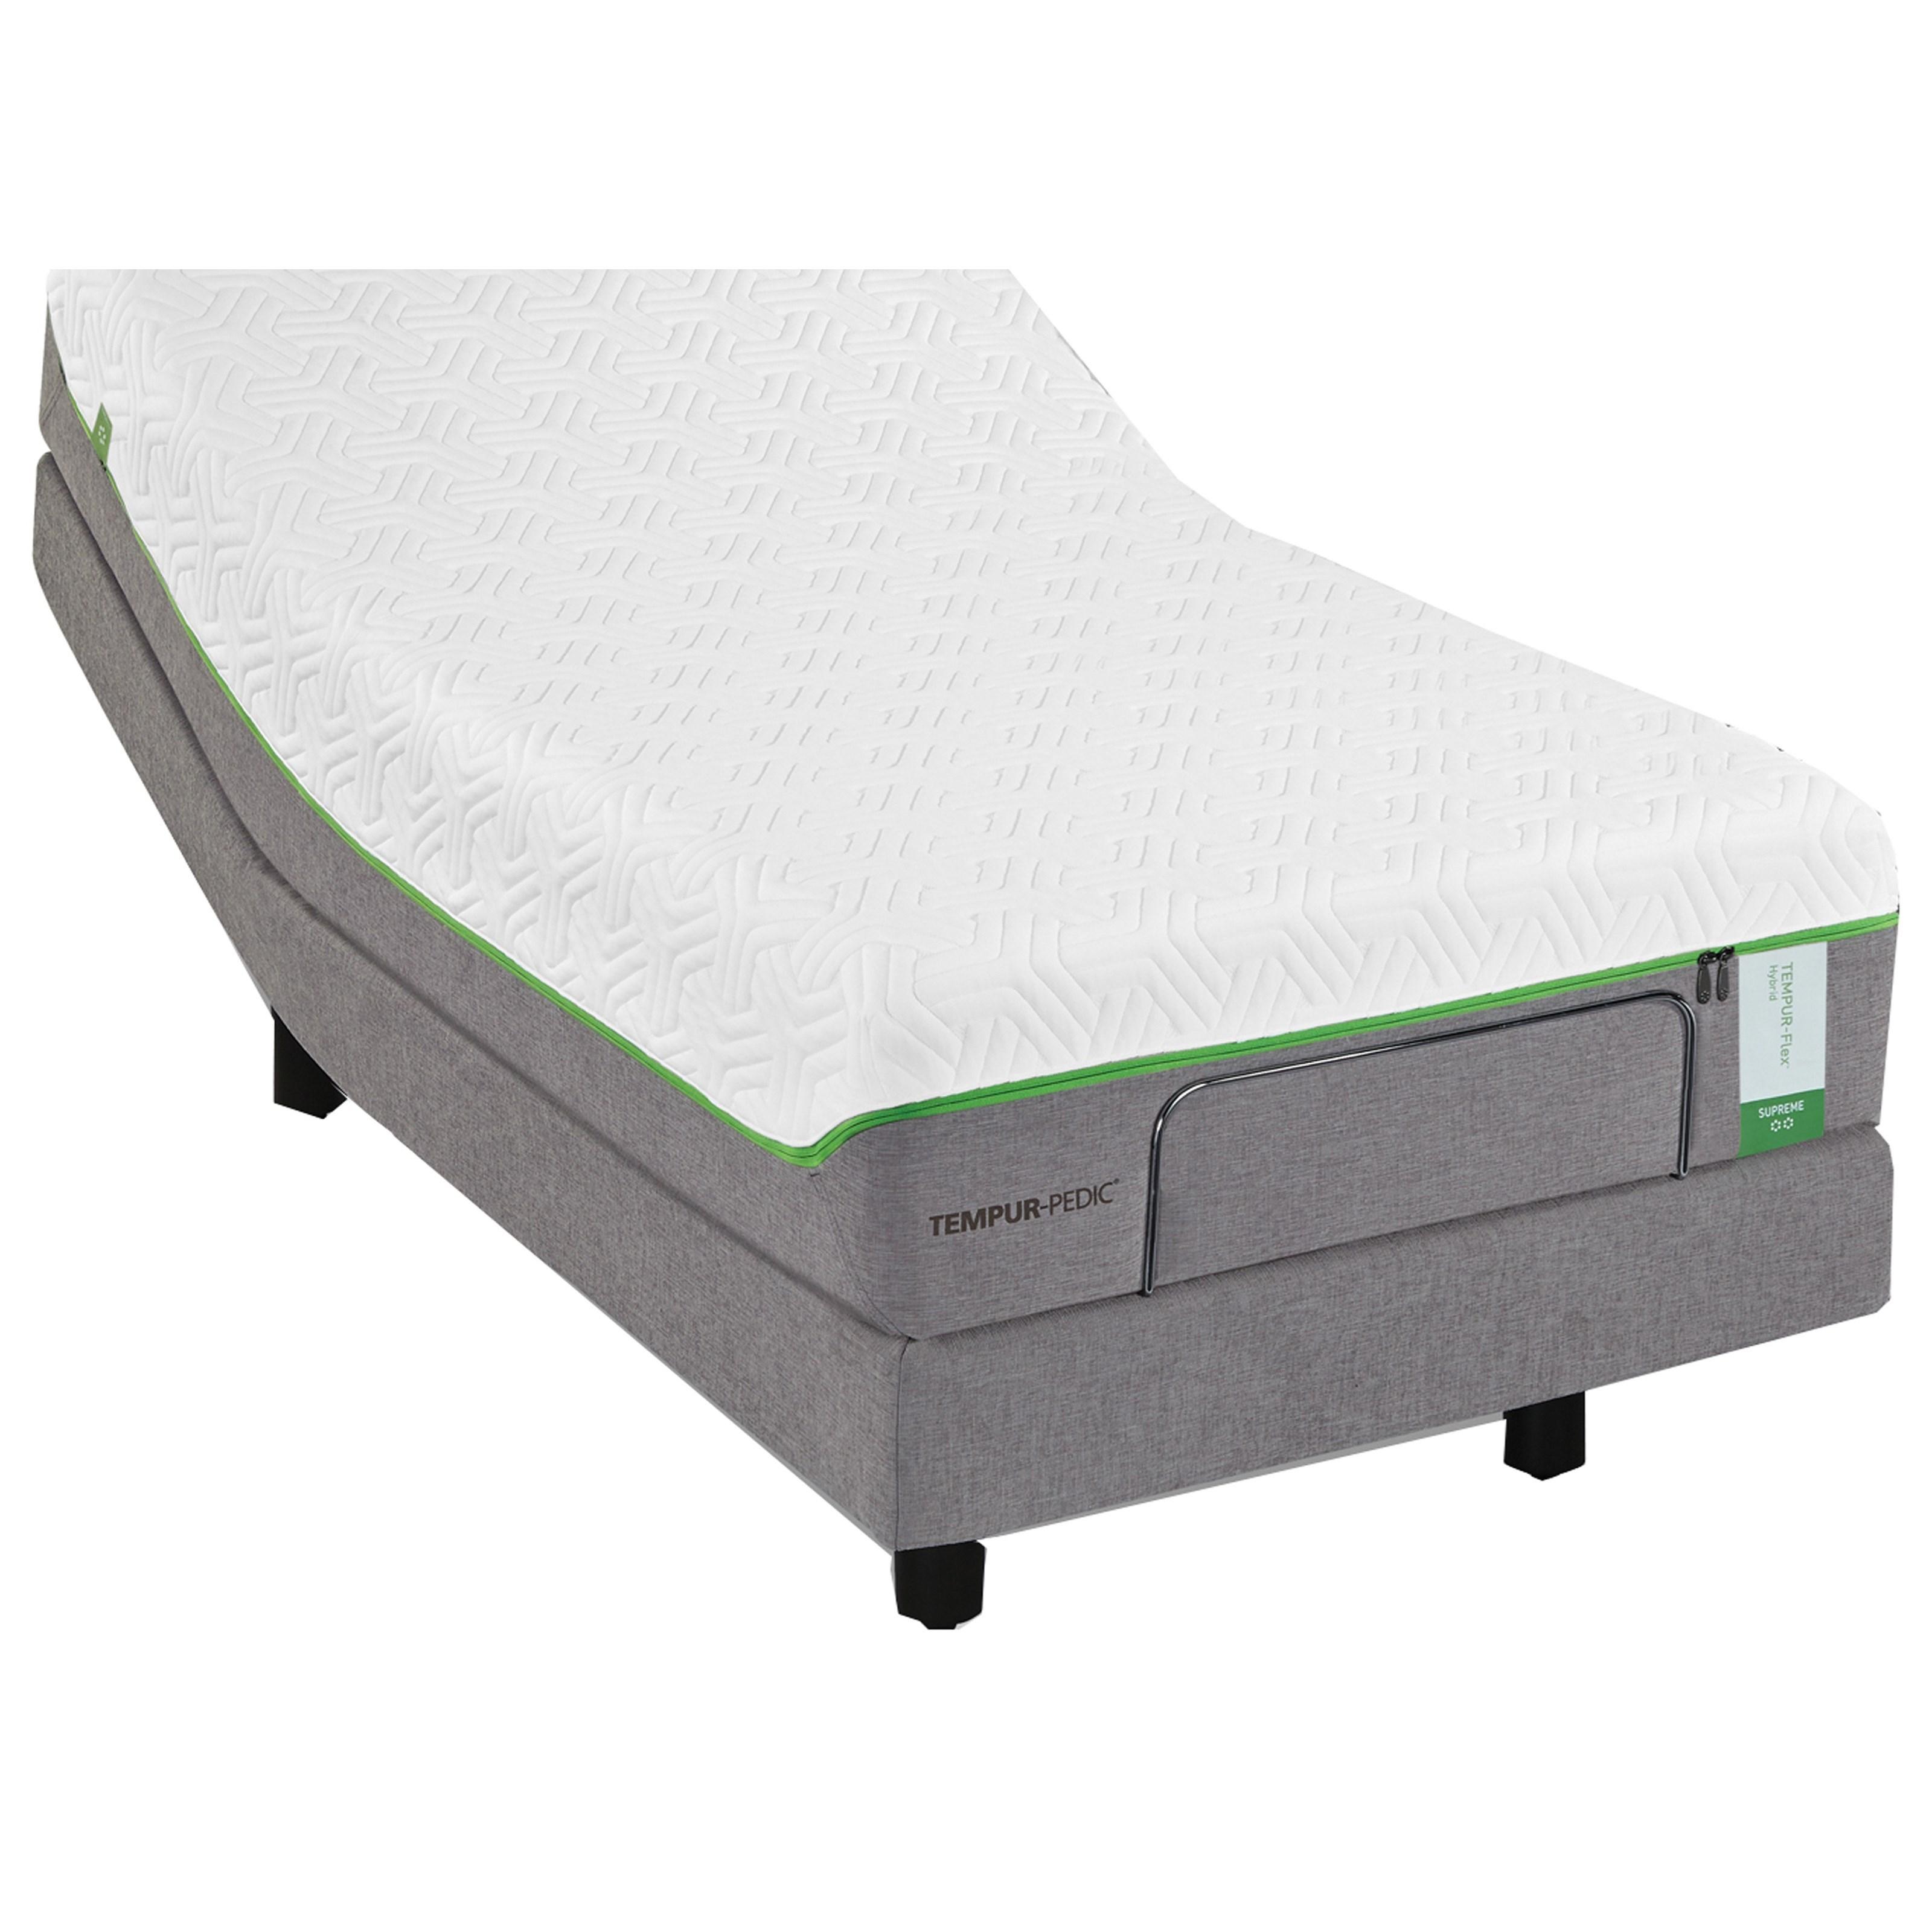 Tempur-Pedic® TEMPUR-Flex Elite King Medium Soft Plush Mattress Set - Item Number: 10117170+2x25565220